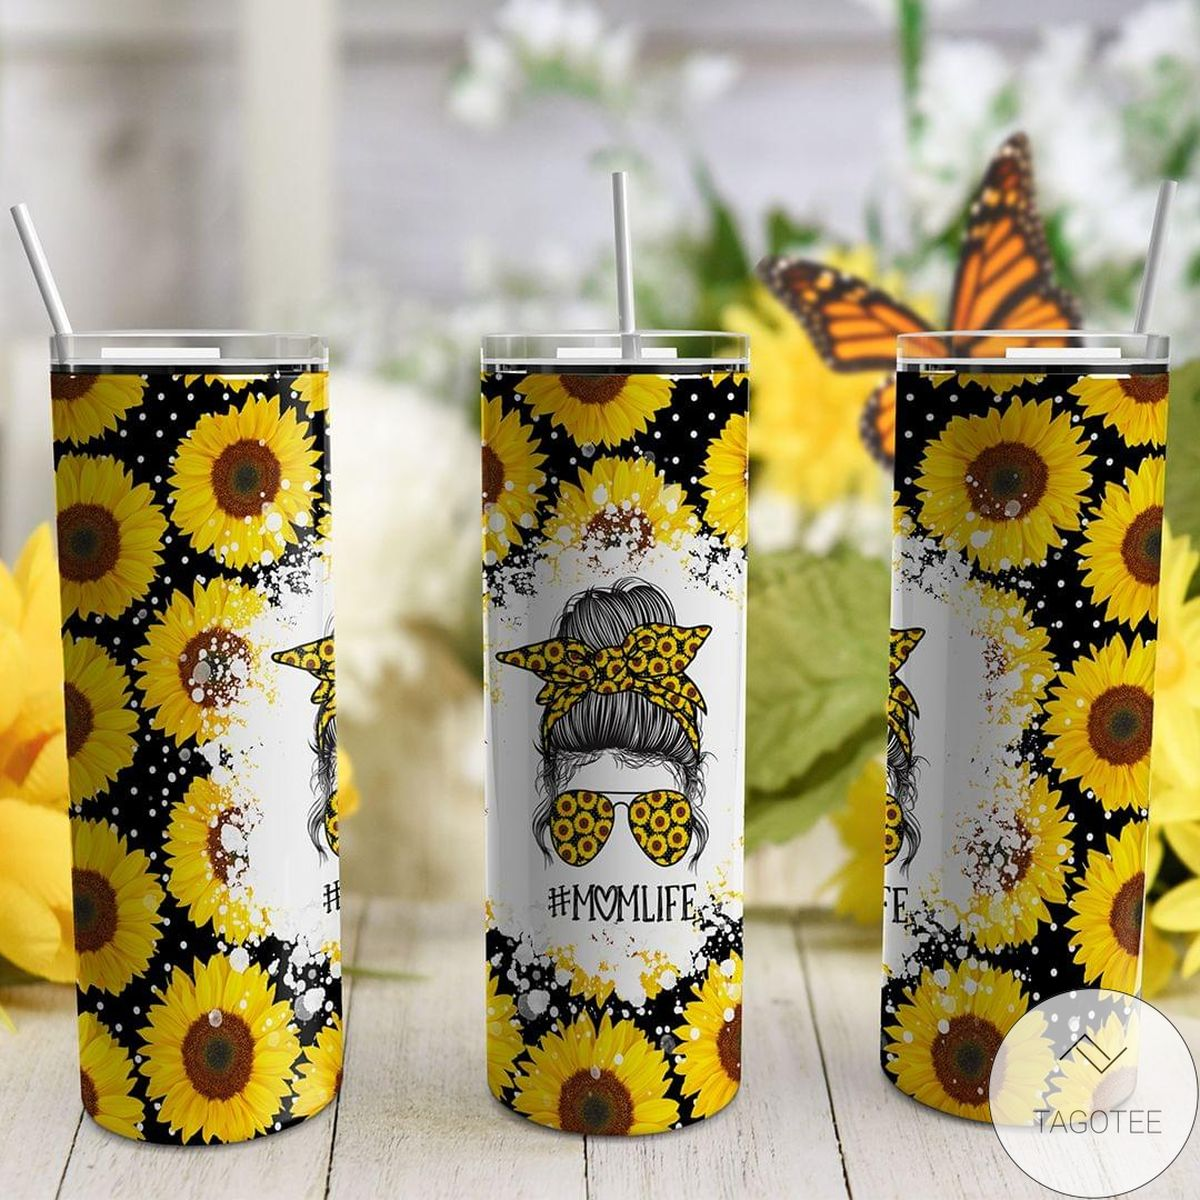 #Momlife Sunflowers Skinny Tumbler